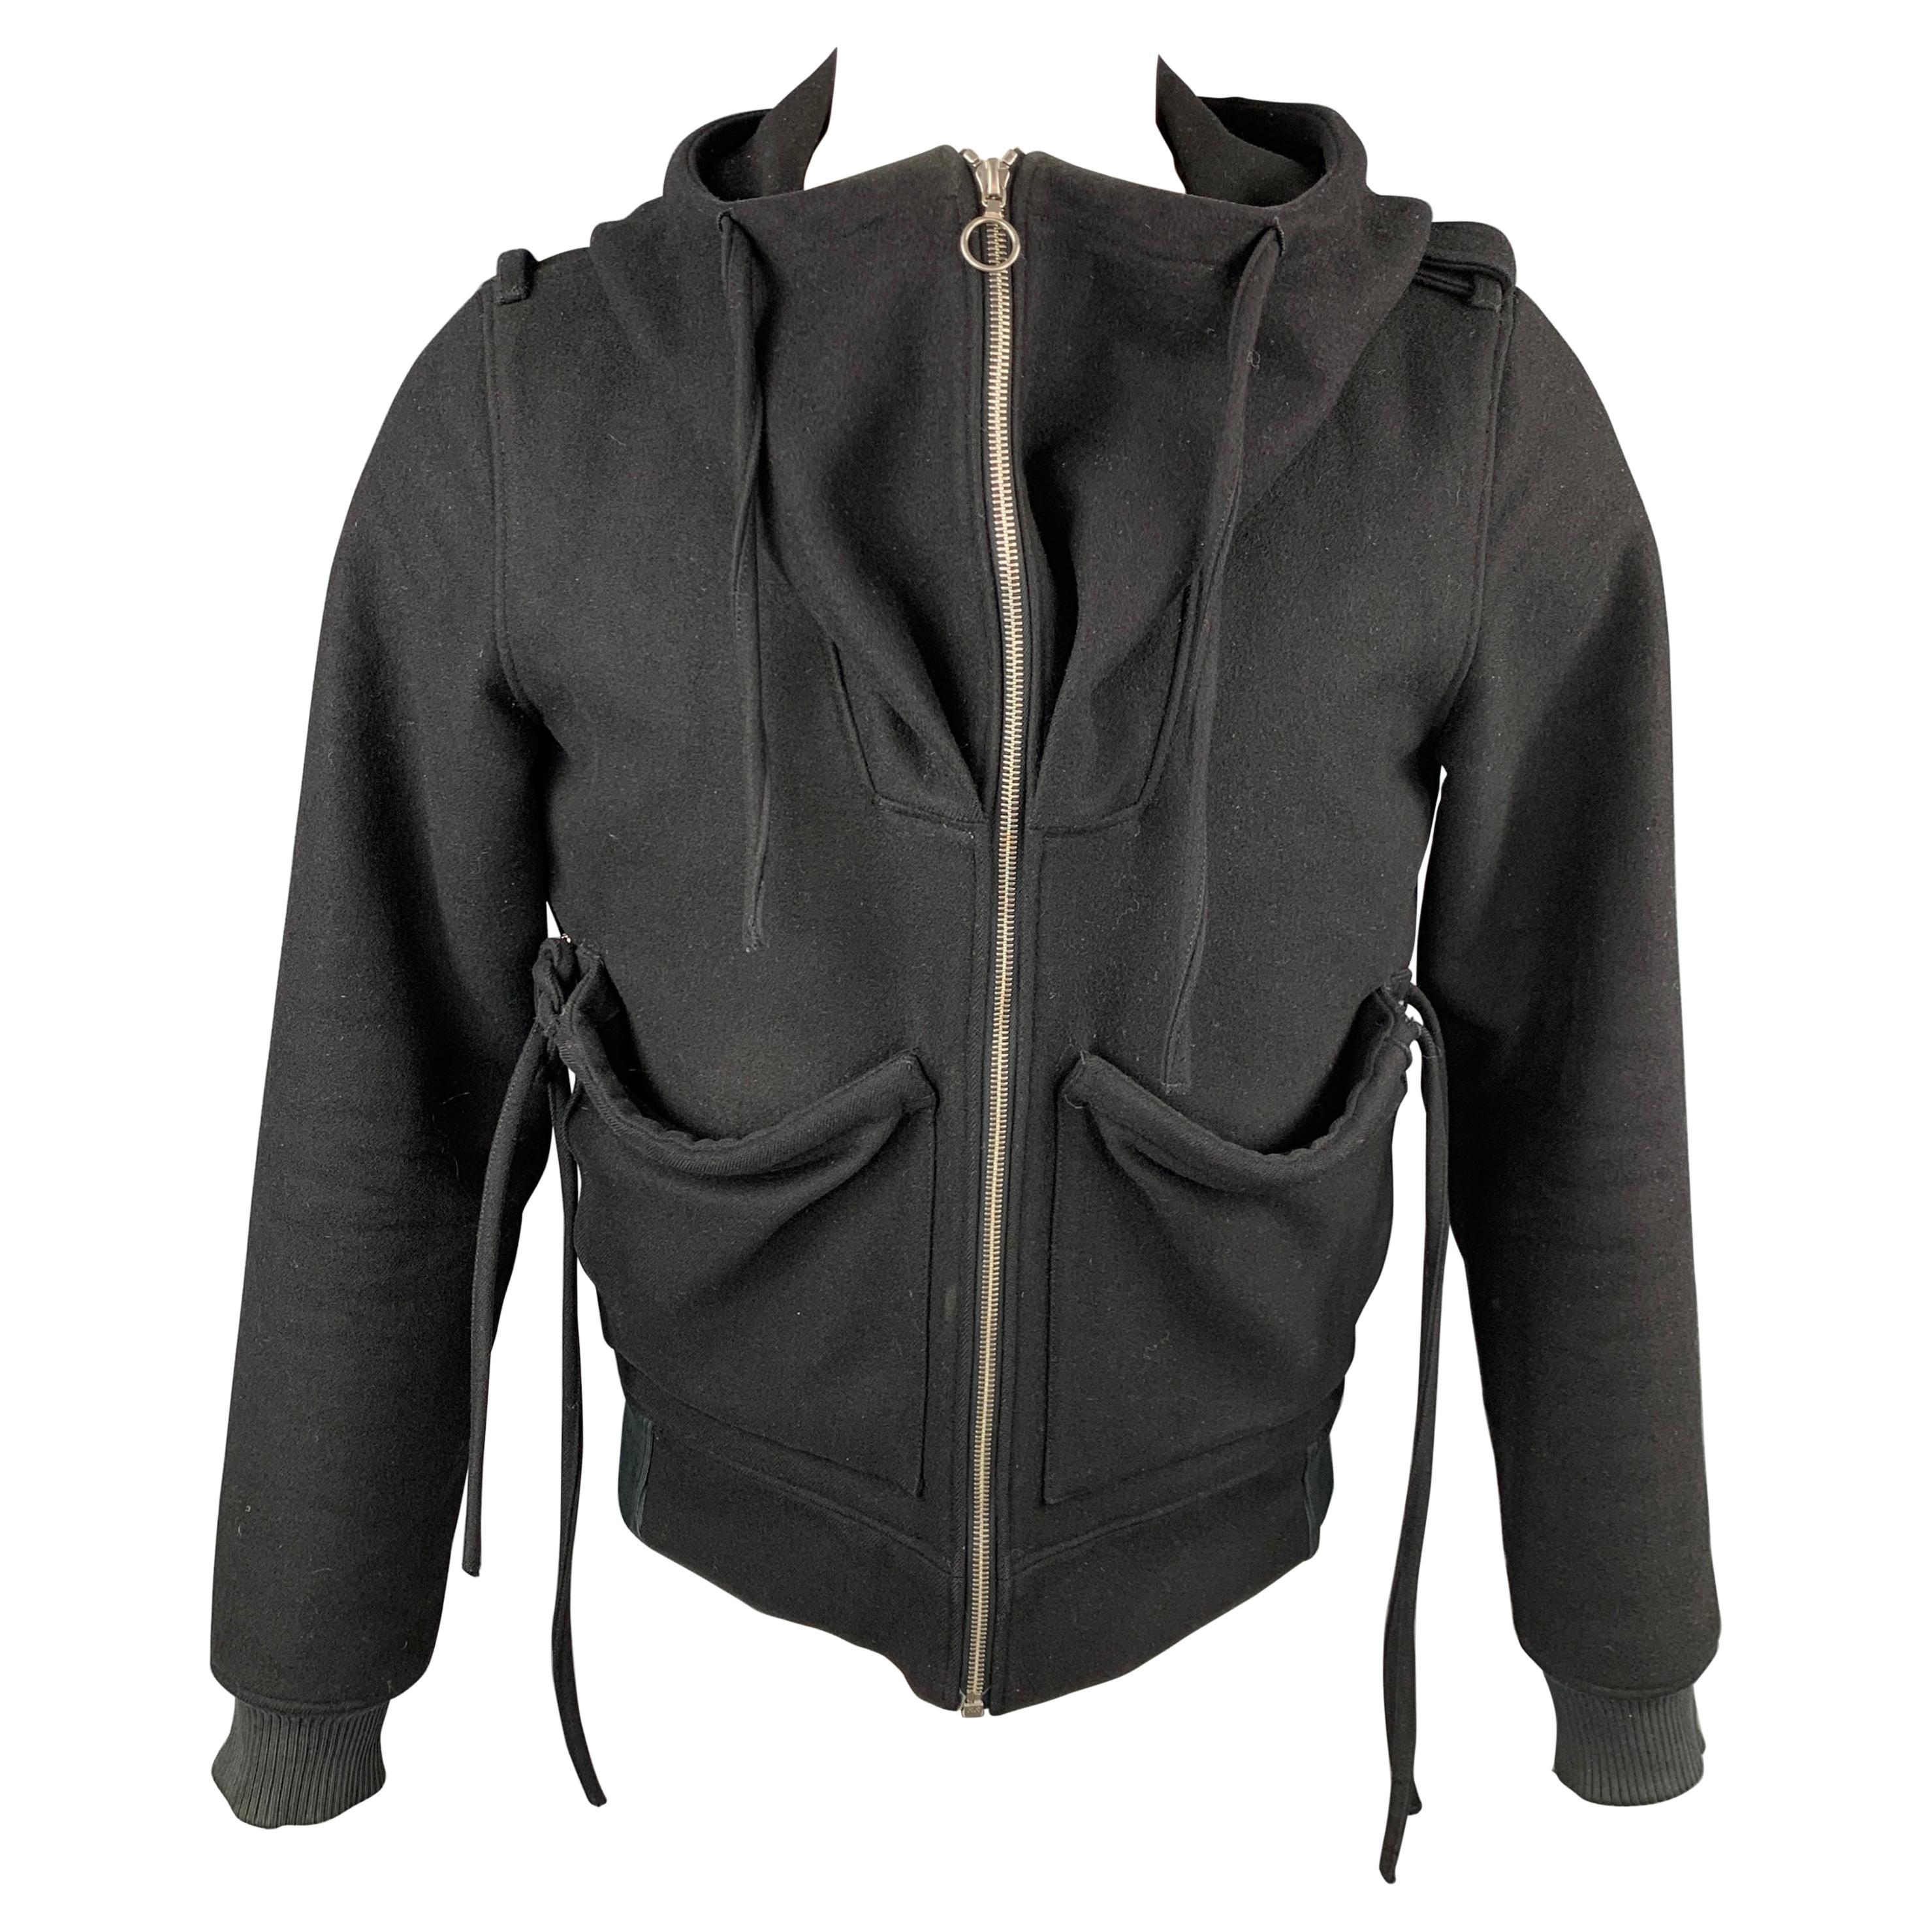 KRIS VAN ASSCHE Size 38 Black Wool Blend Hooded Jacket